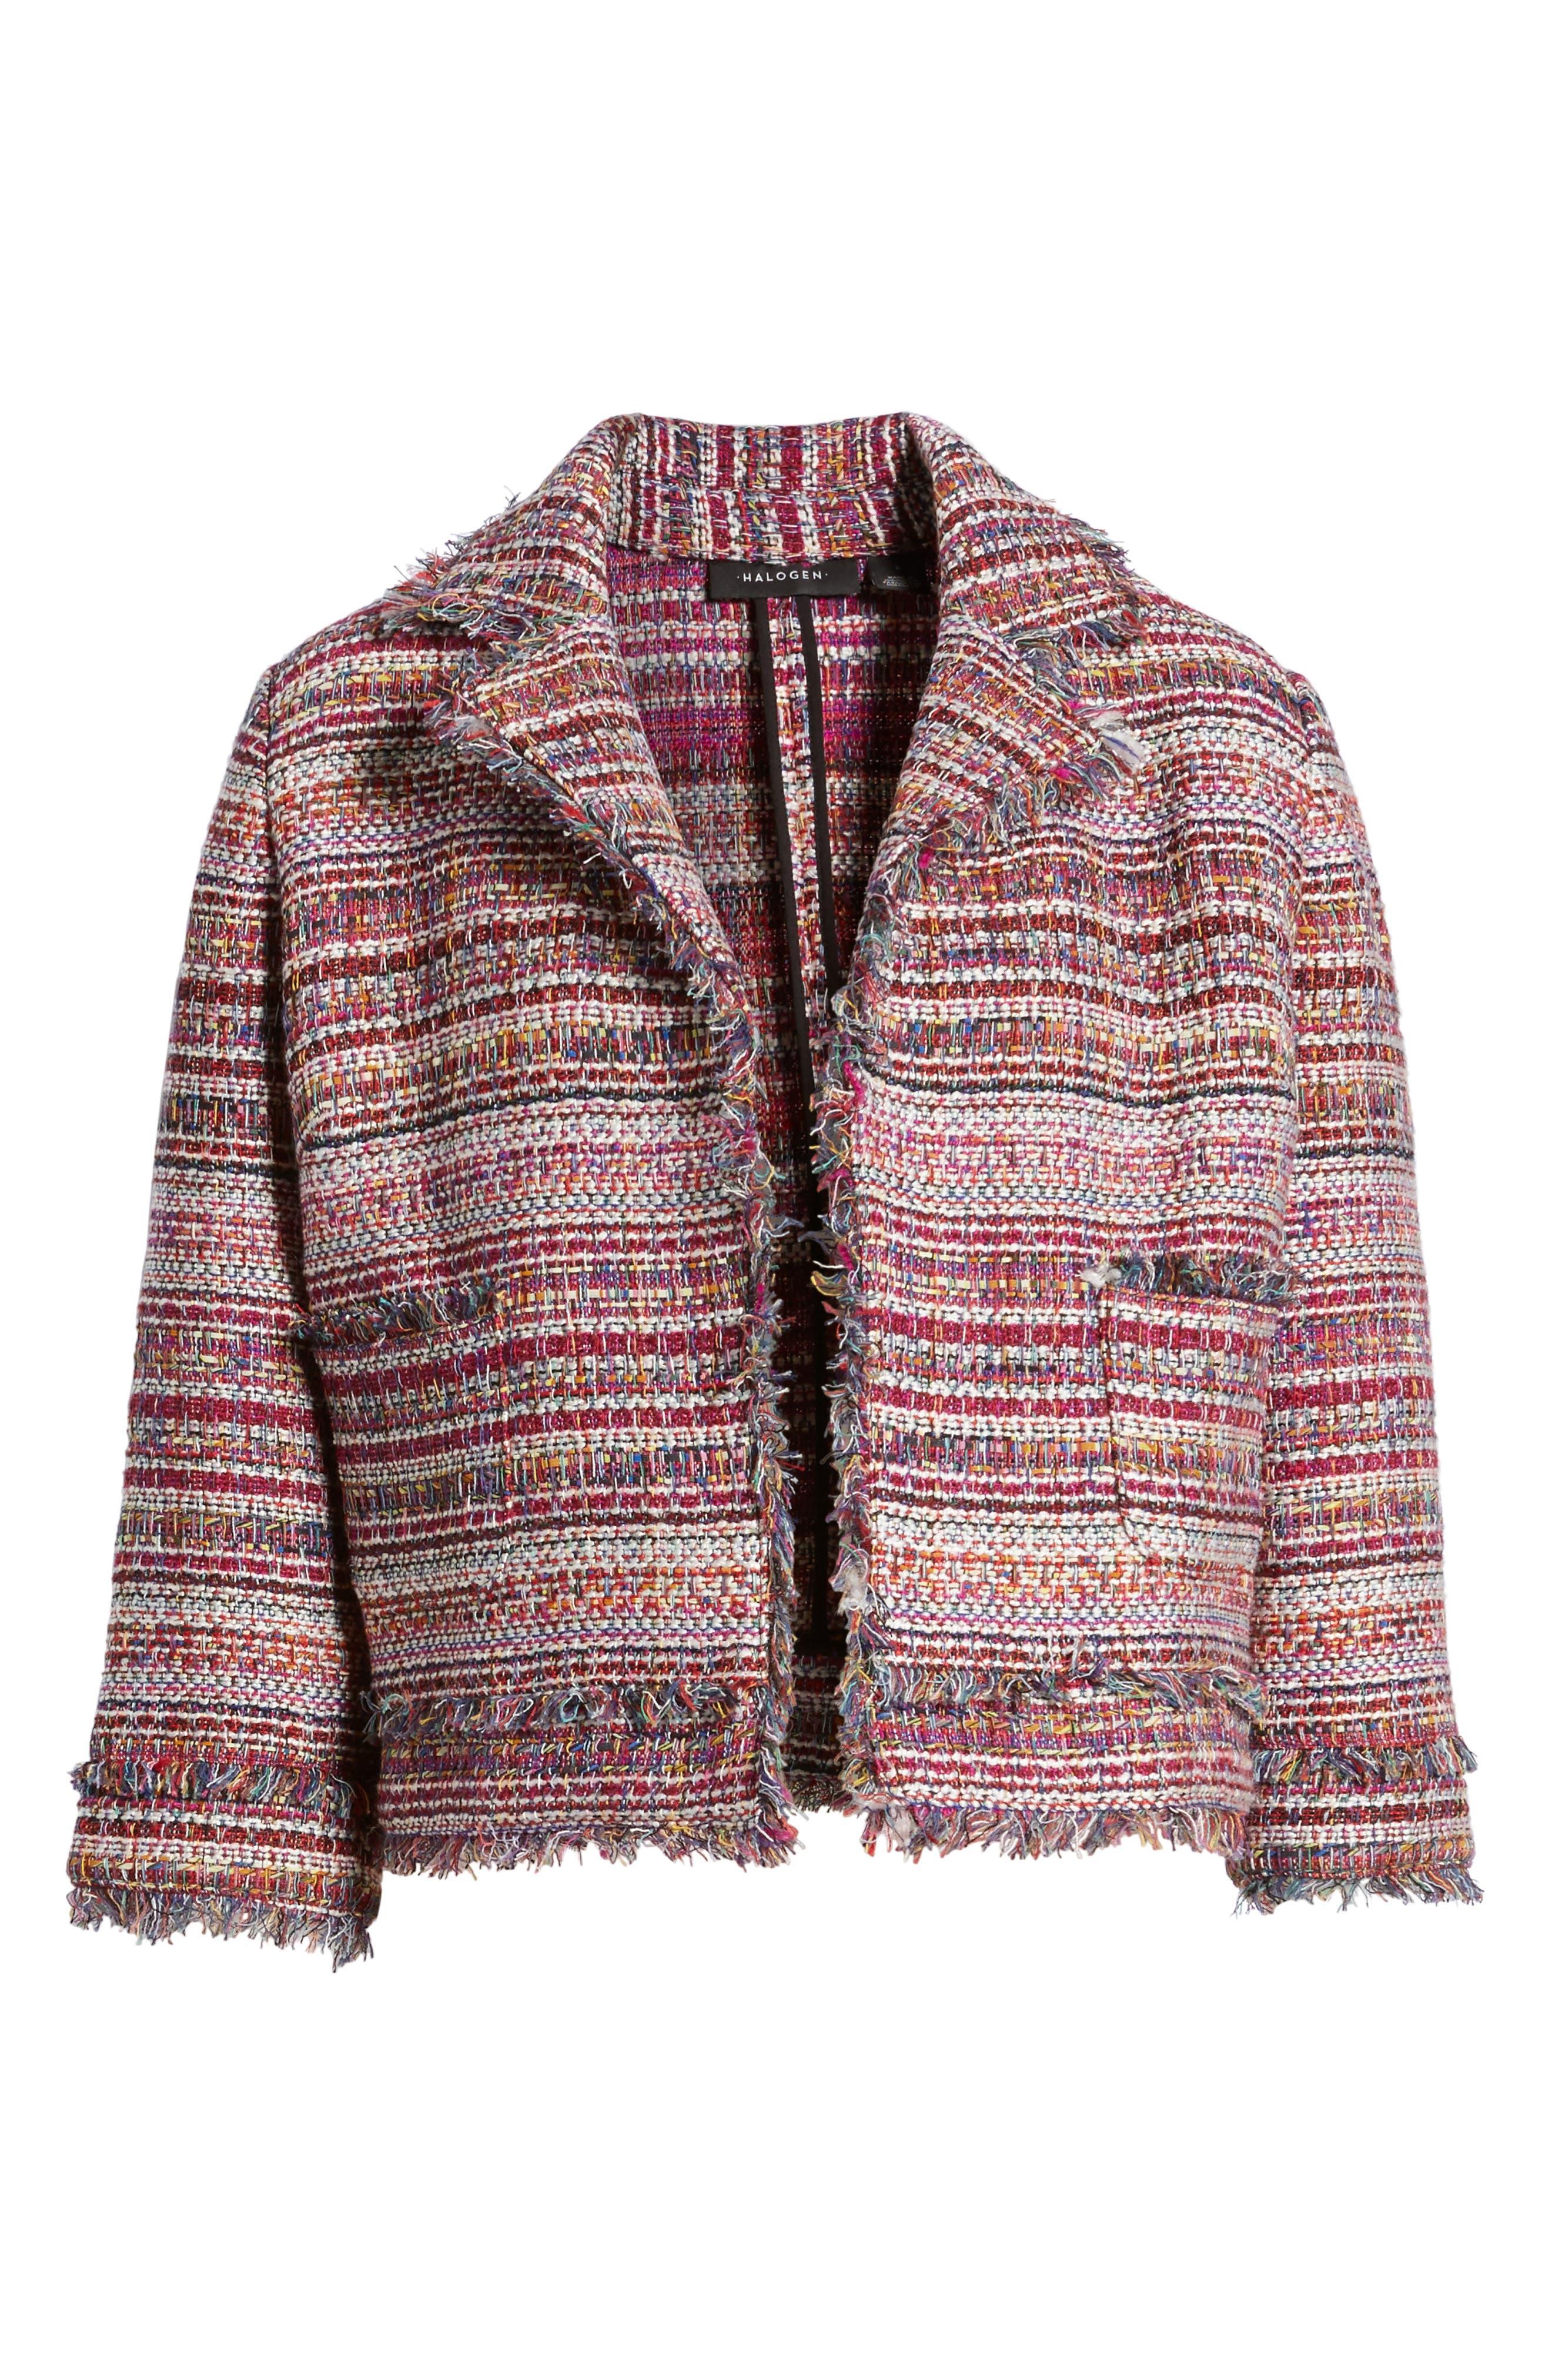 Tweed Open Front Jacket,                             Alternate thumbnail 6, color,                             Red Multi Tweed